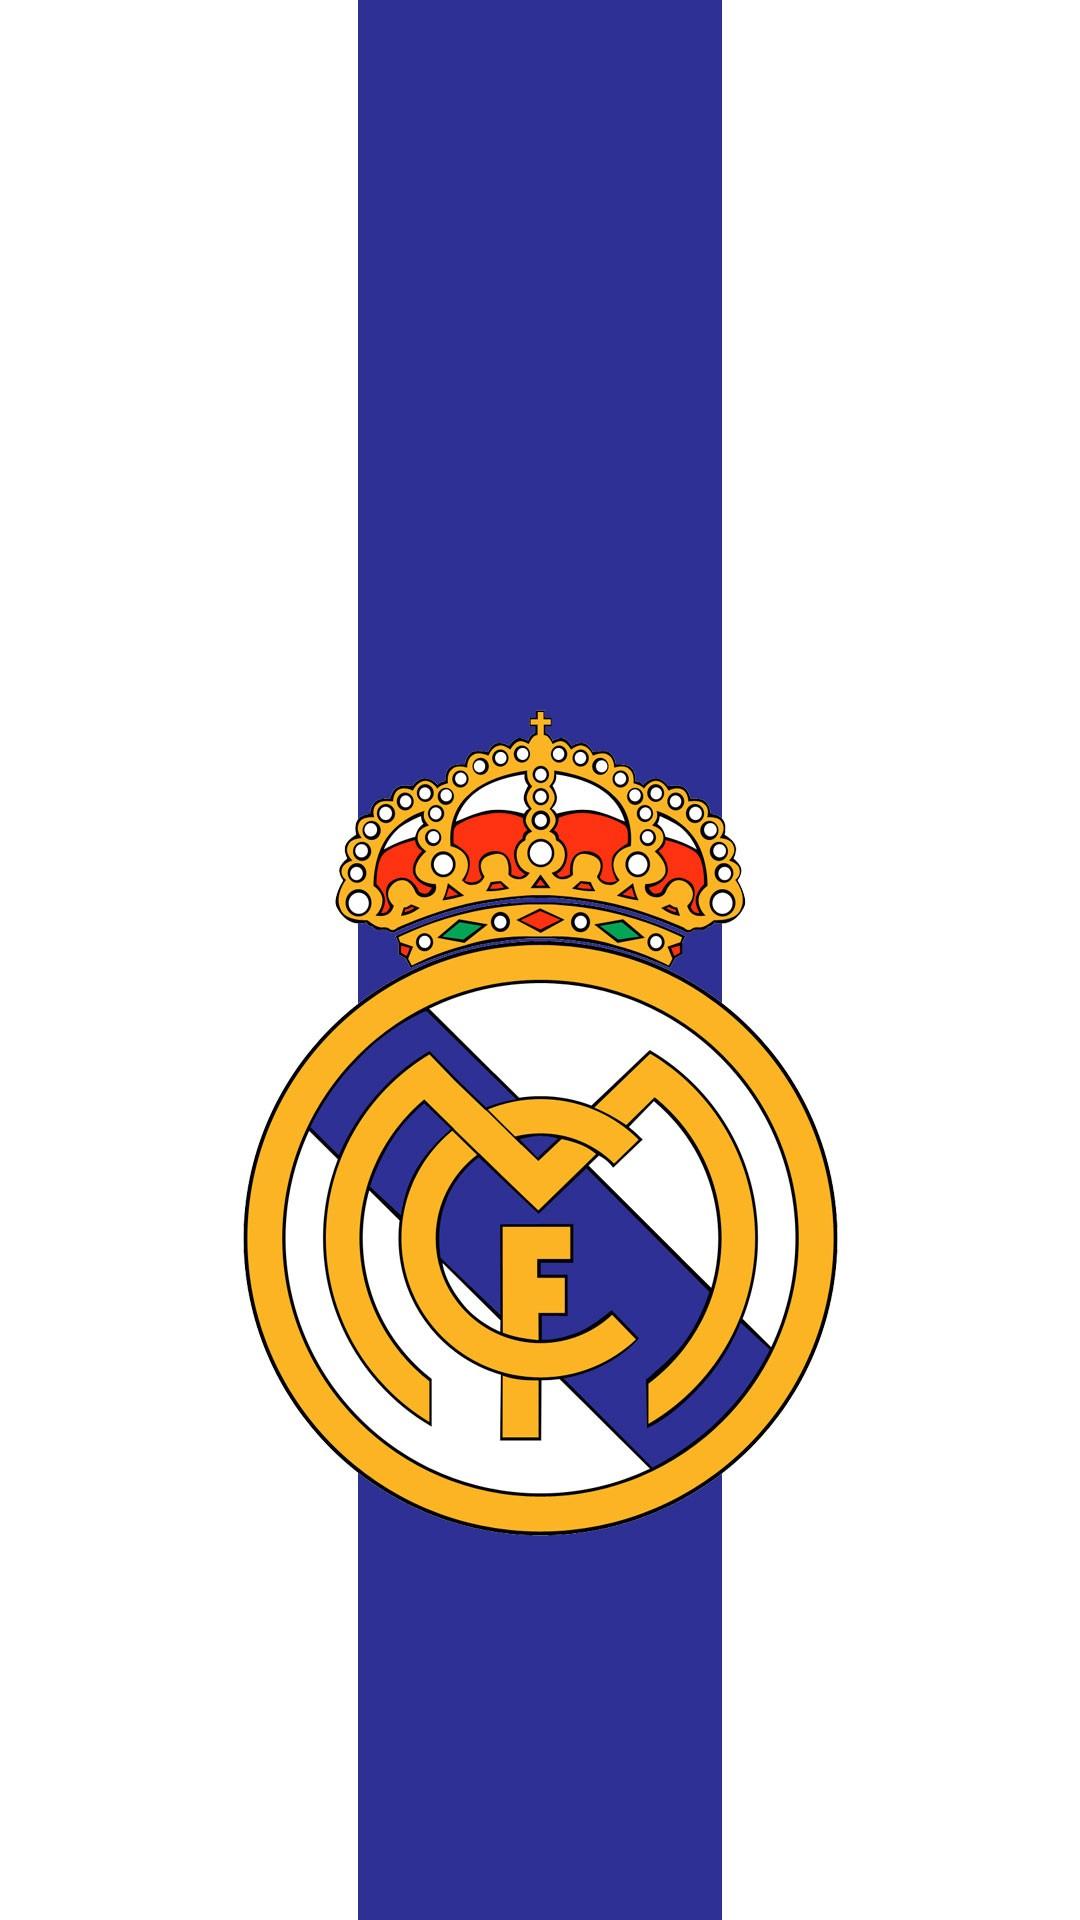 Real Madrid Logo Iphone7 Wallpaper Iphone Wallpaper